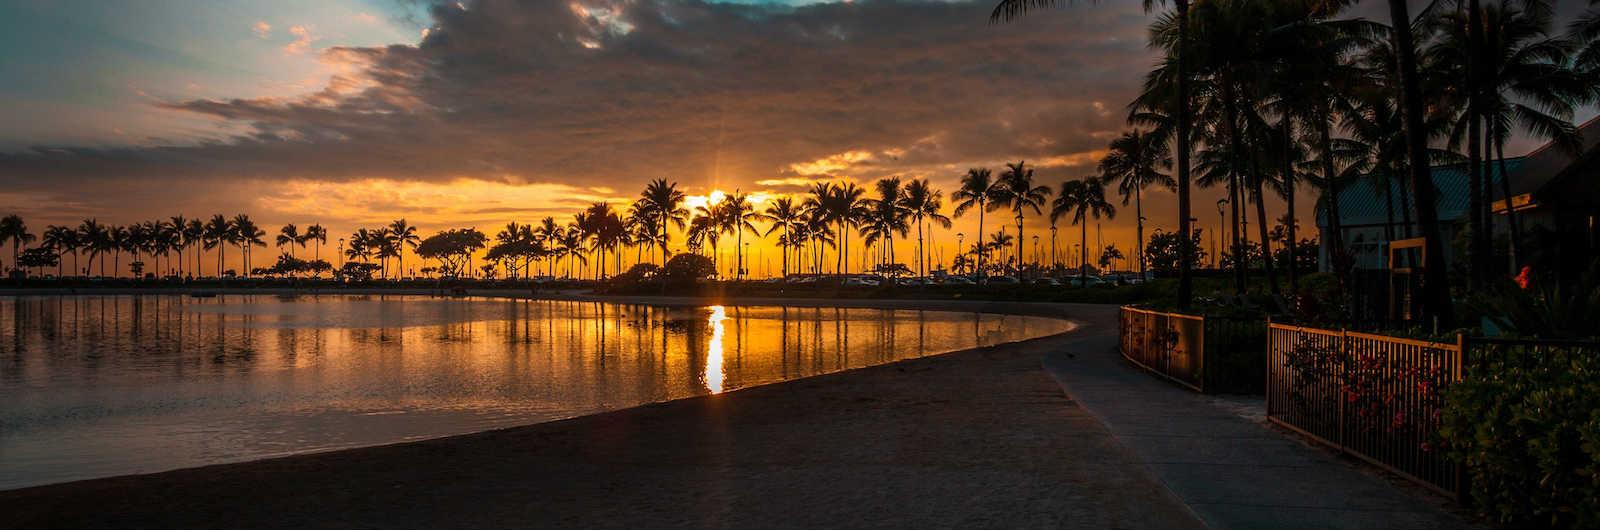 10 Hawaiian Shirts to Show the World How Fun You Are